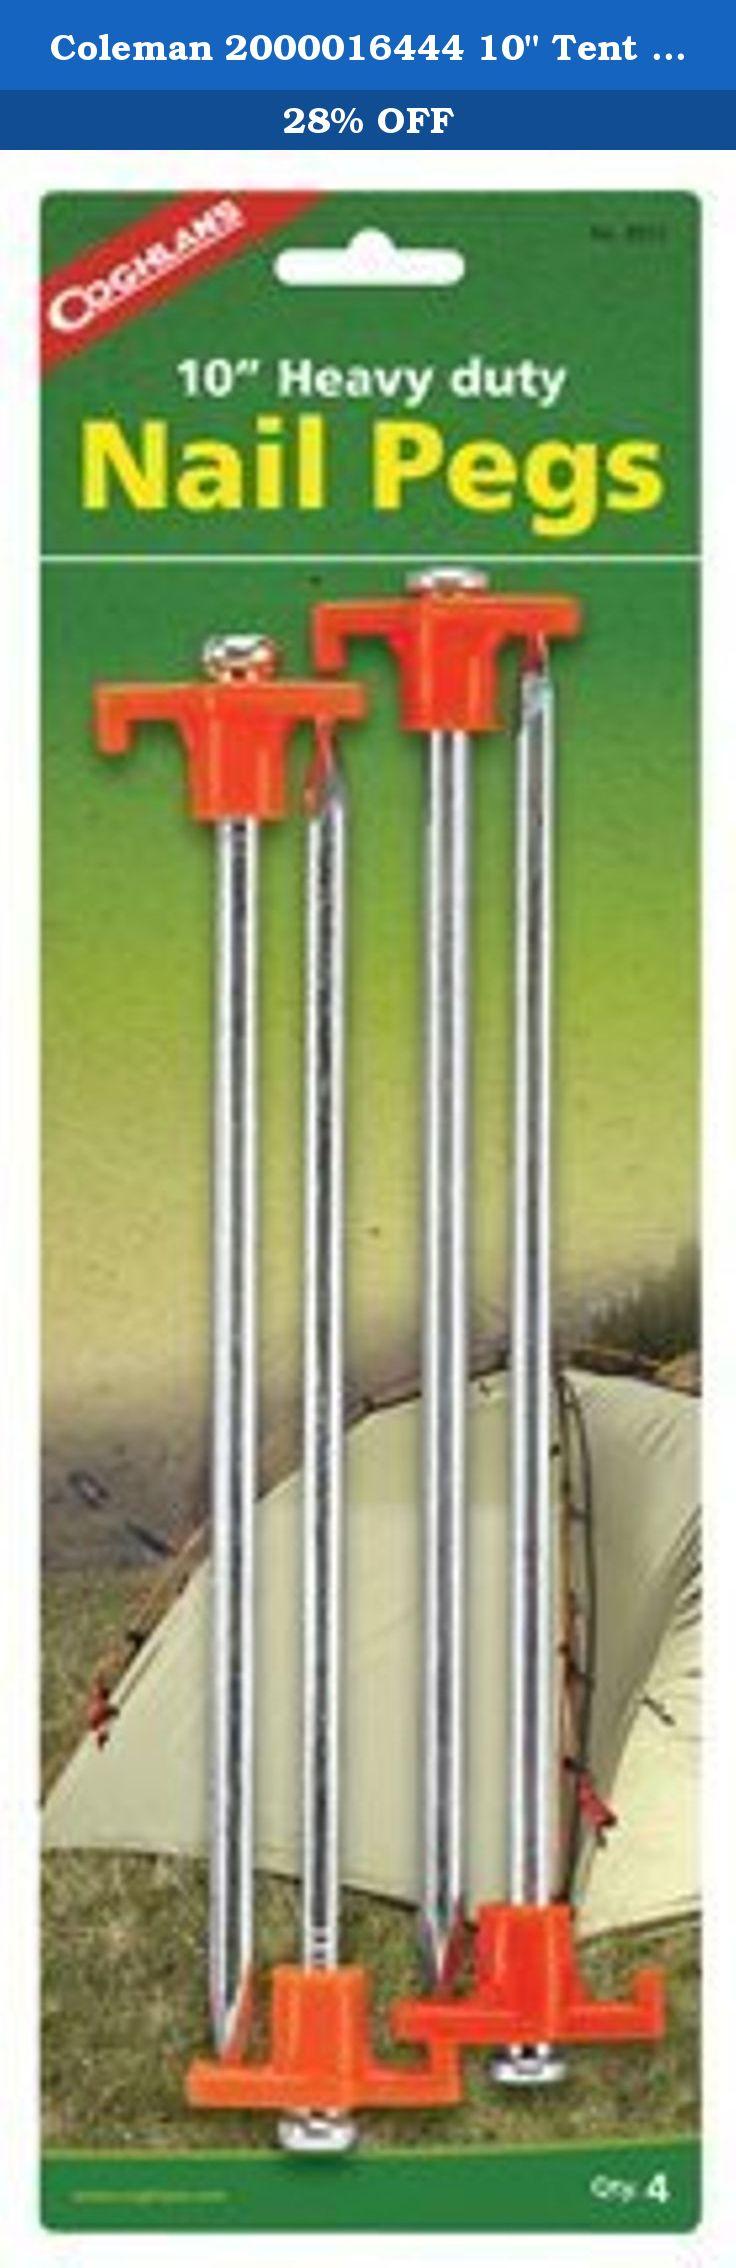 Galvanized Steel Pegs Rust-Free Ram-Pro Tent Garden Stakes Heavy Duty